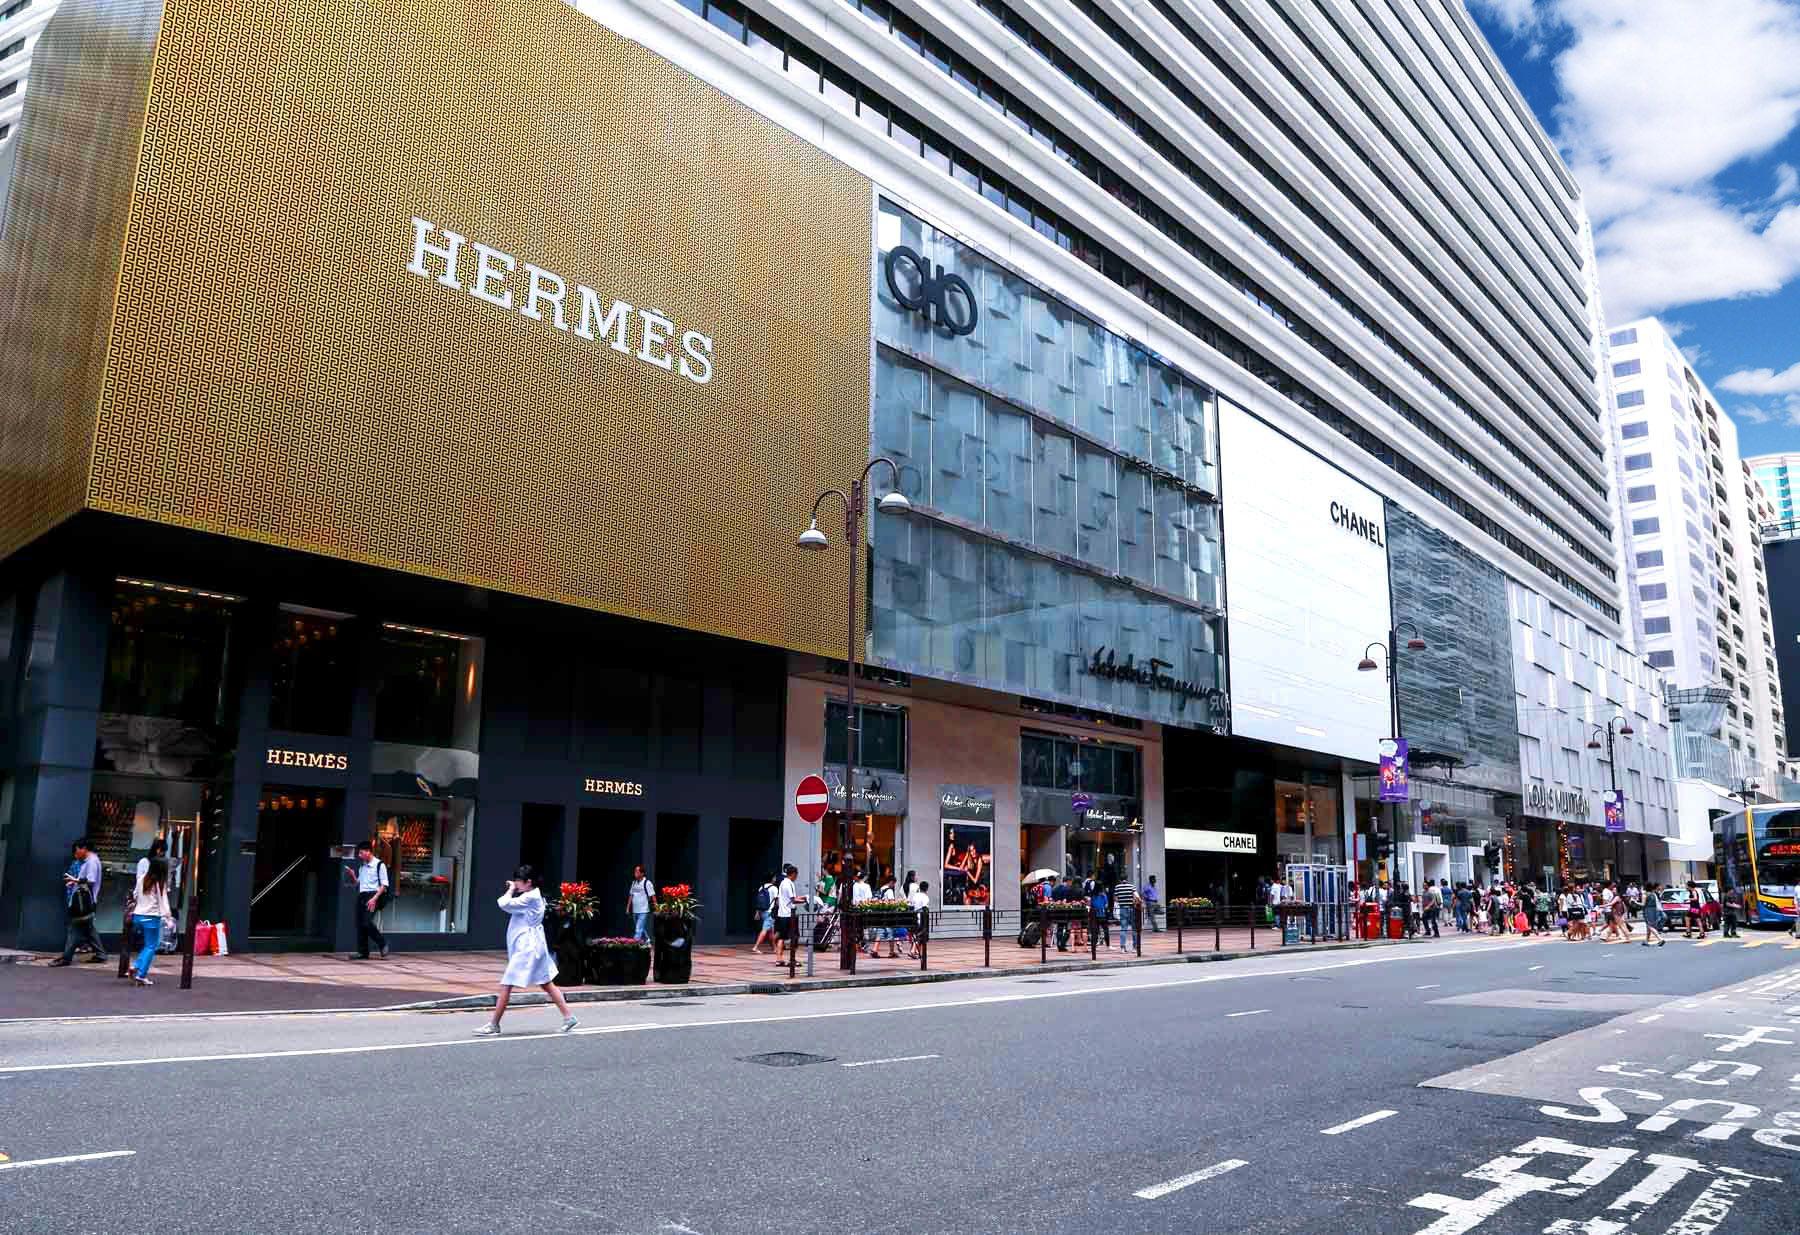 Making HK shopping more fun at Kowloon Shangri La